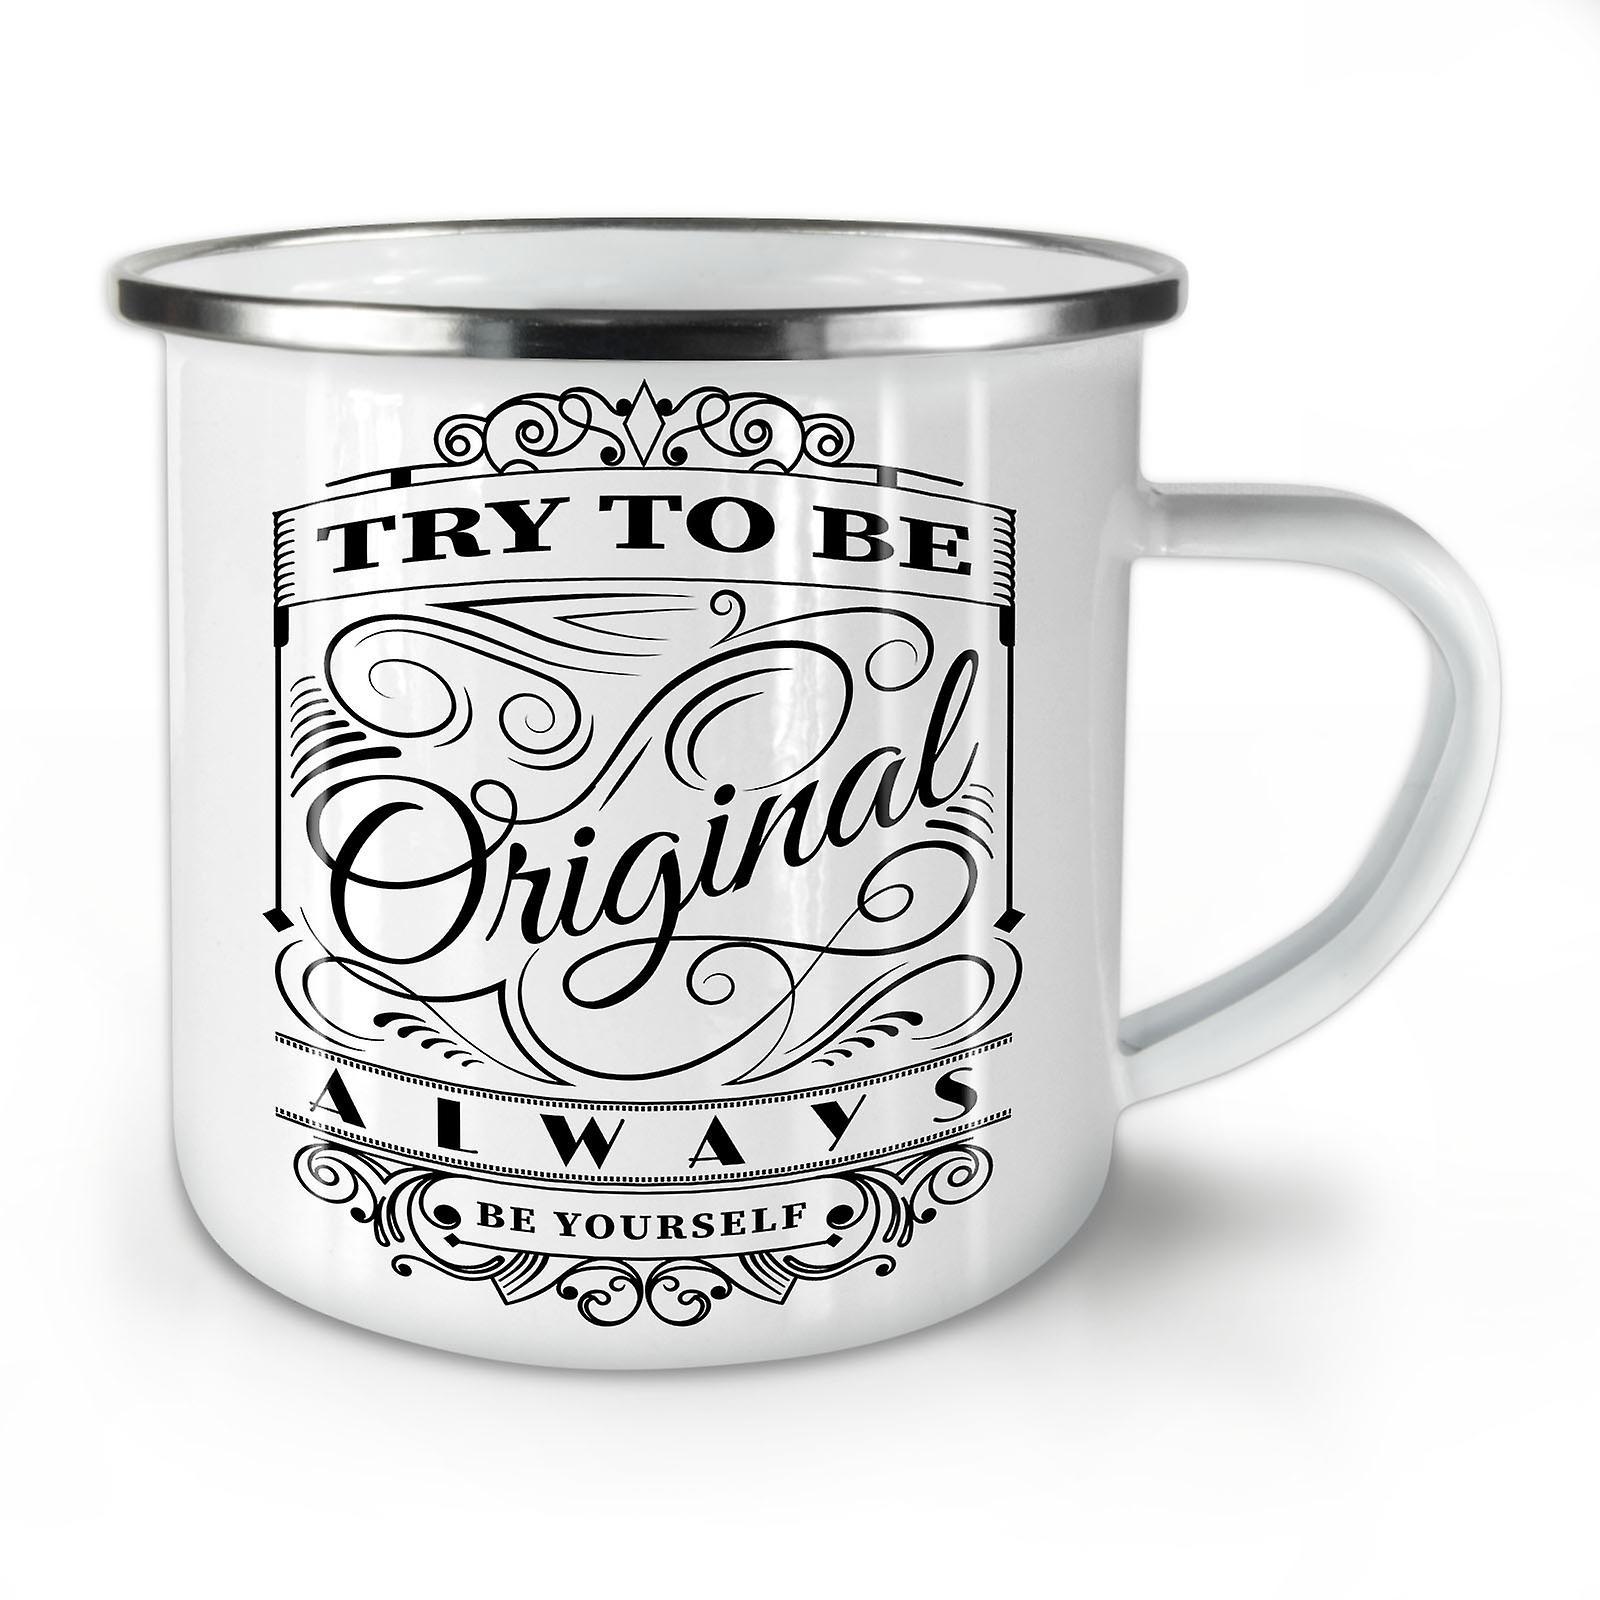 Unique Coffee OzWellcoda Be Enamel Whitetea Try New Mug10 To dhCstQr